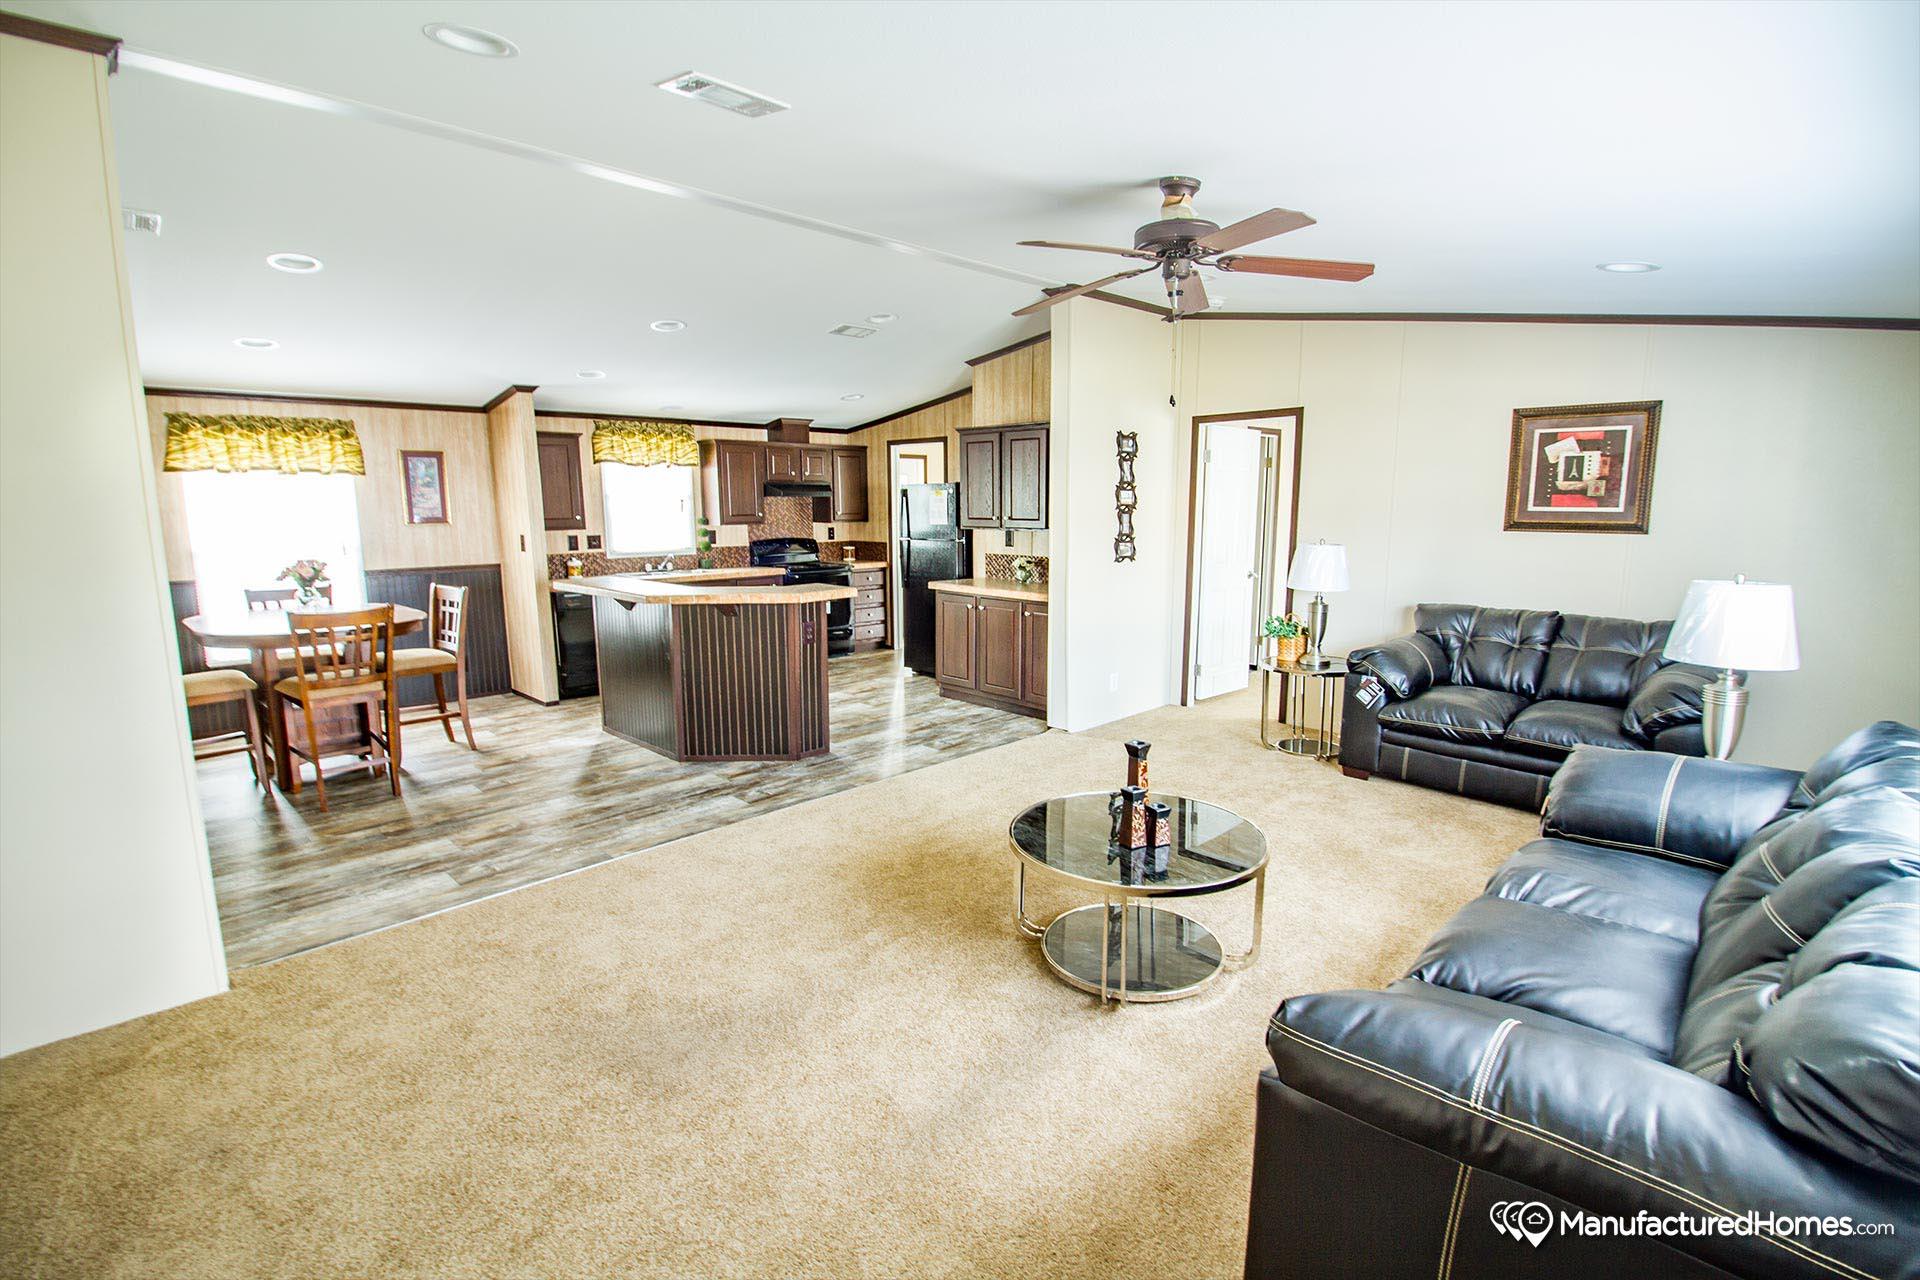 Discover Modular Homes in Denton, TX - Manufactured Home and Modular ...